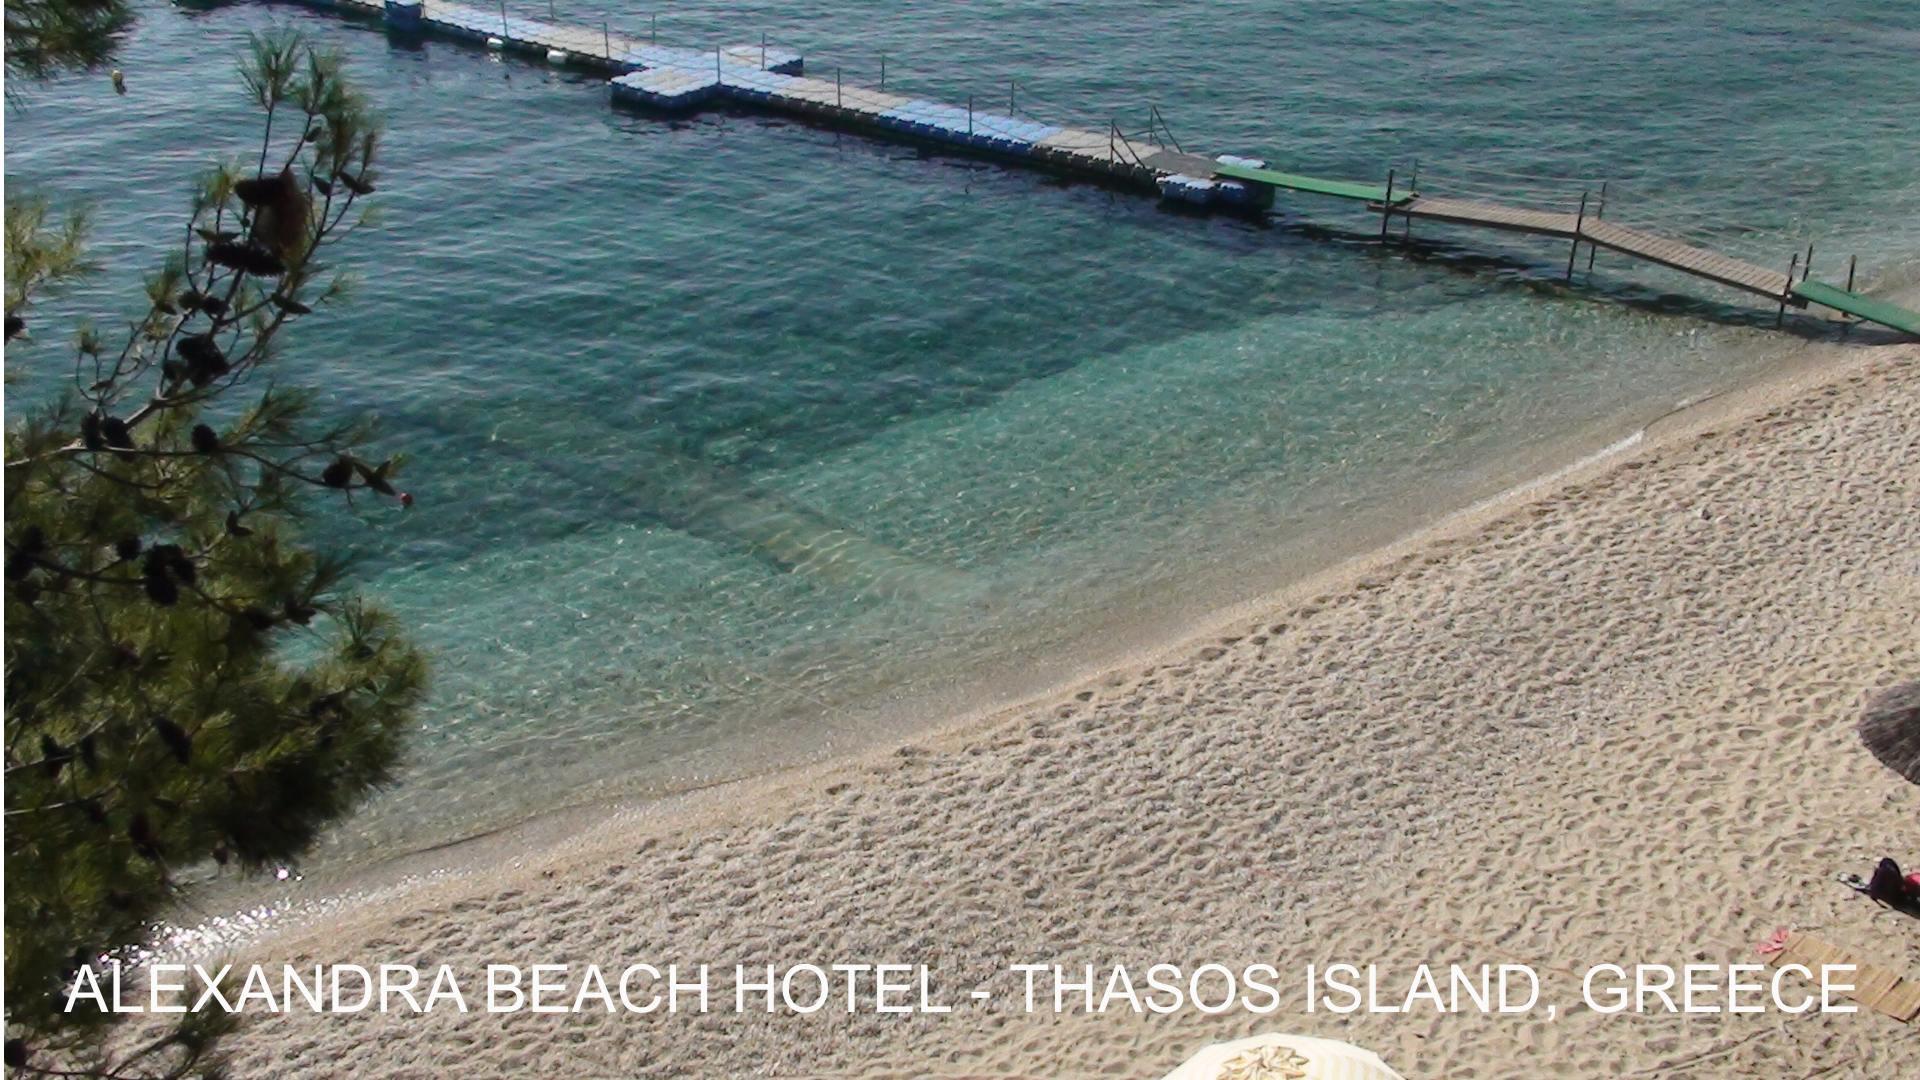 alexandra_beach_hotel3_1920x1080